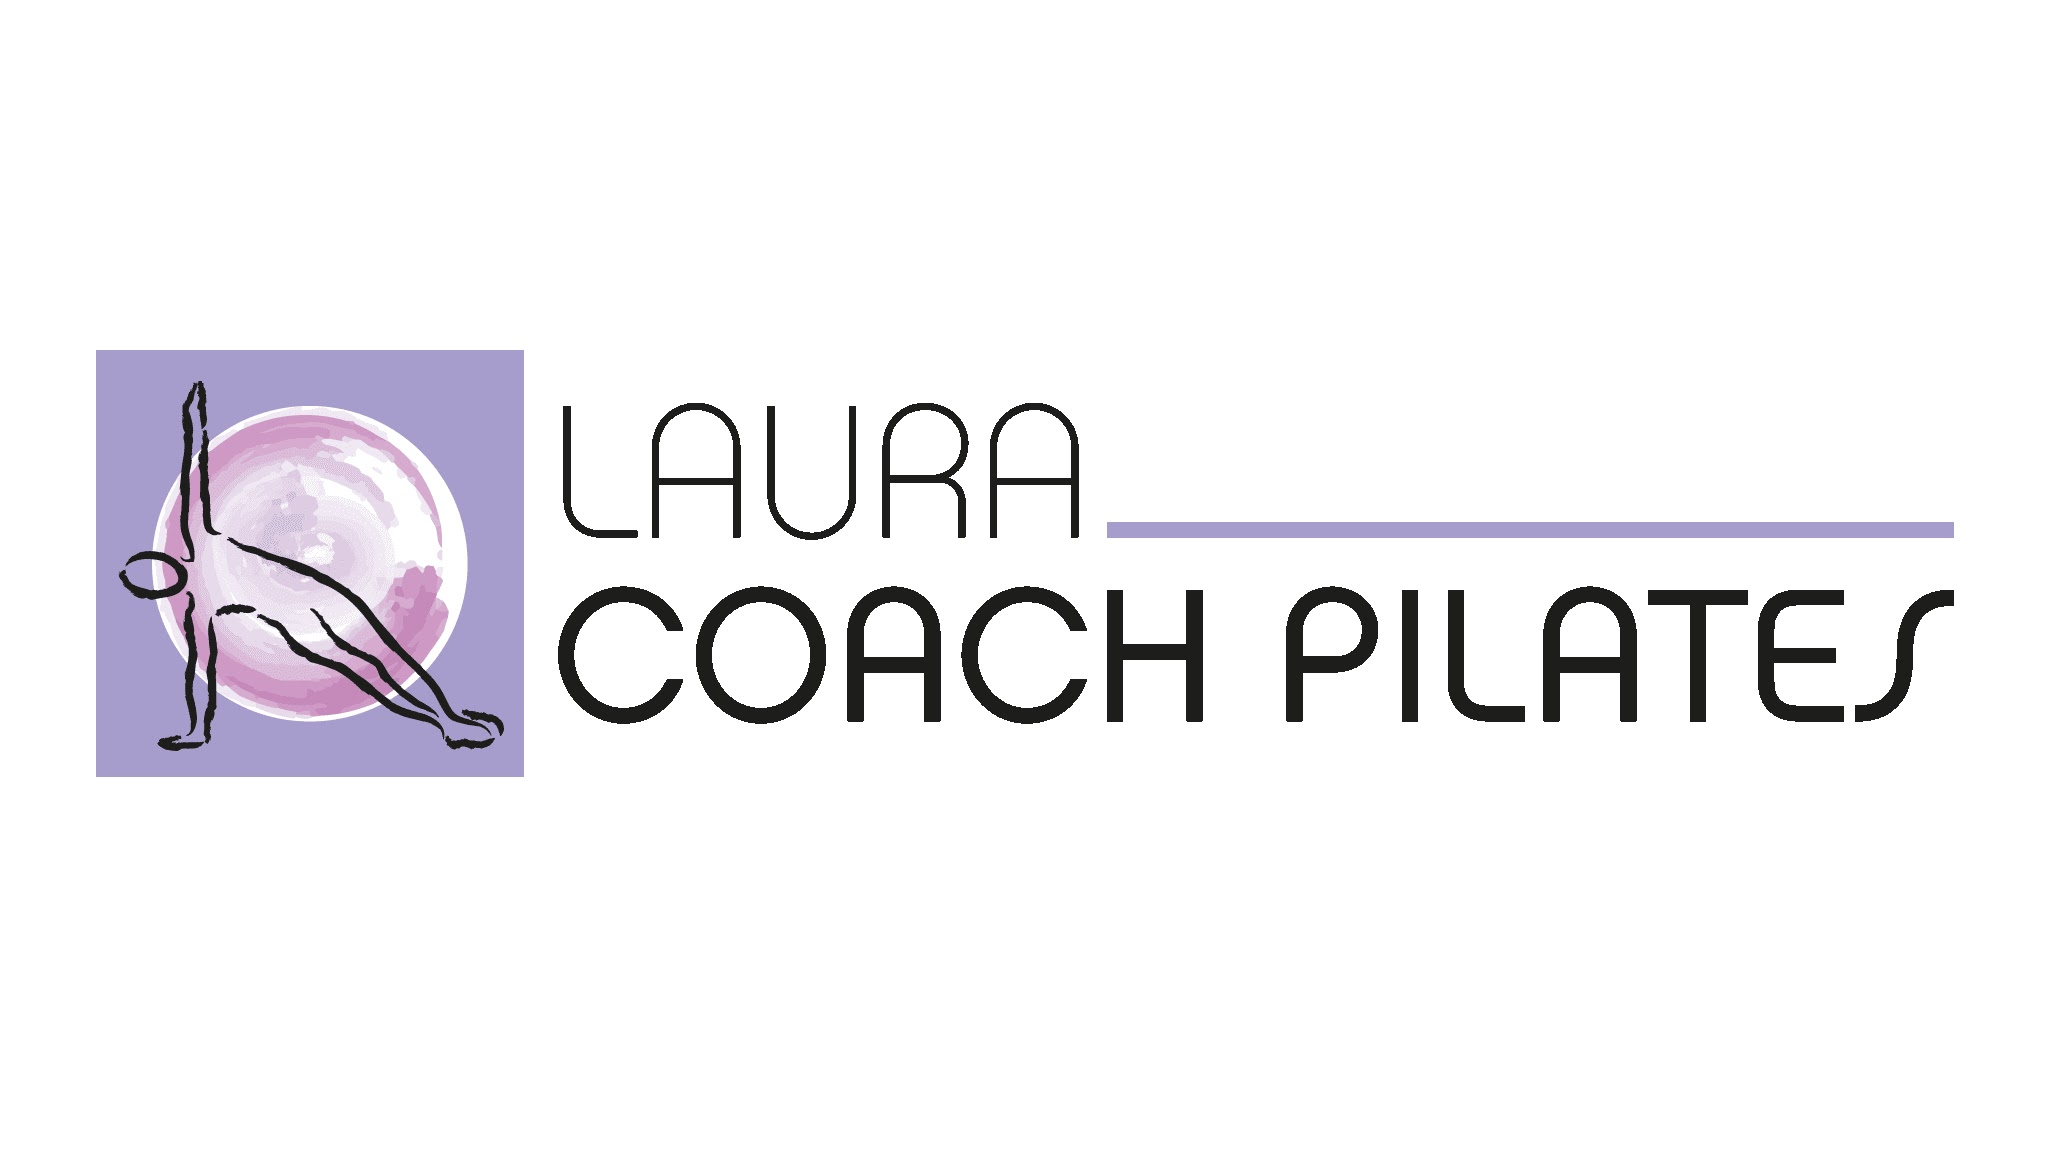 Laura Coach Pilates